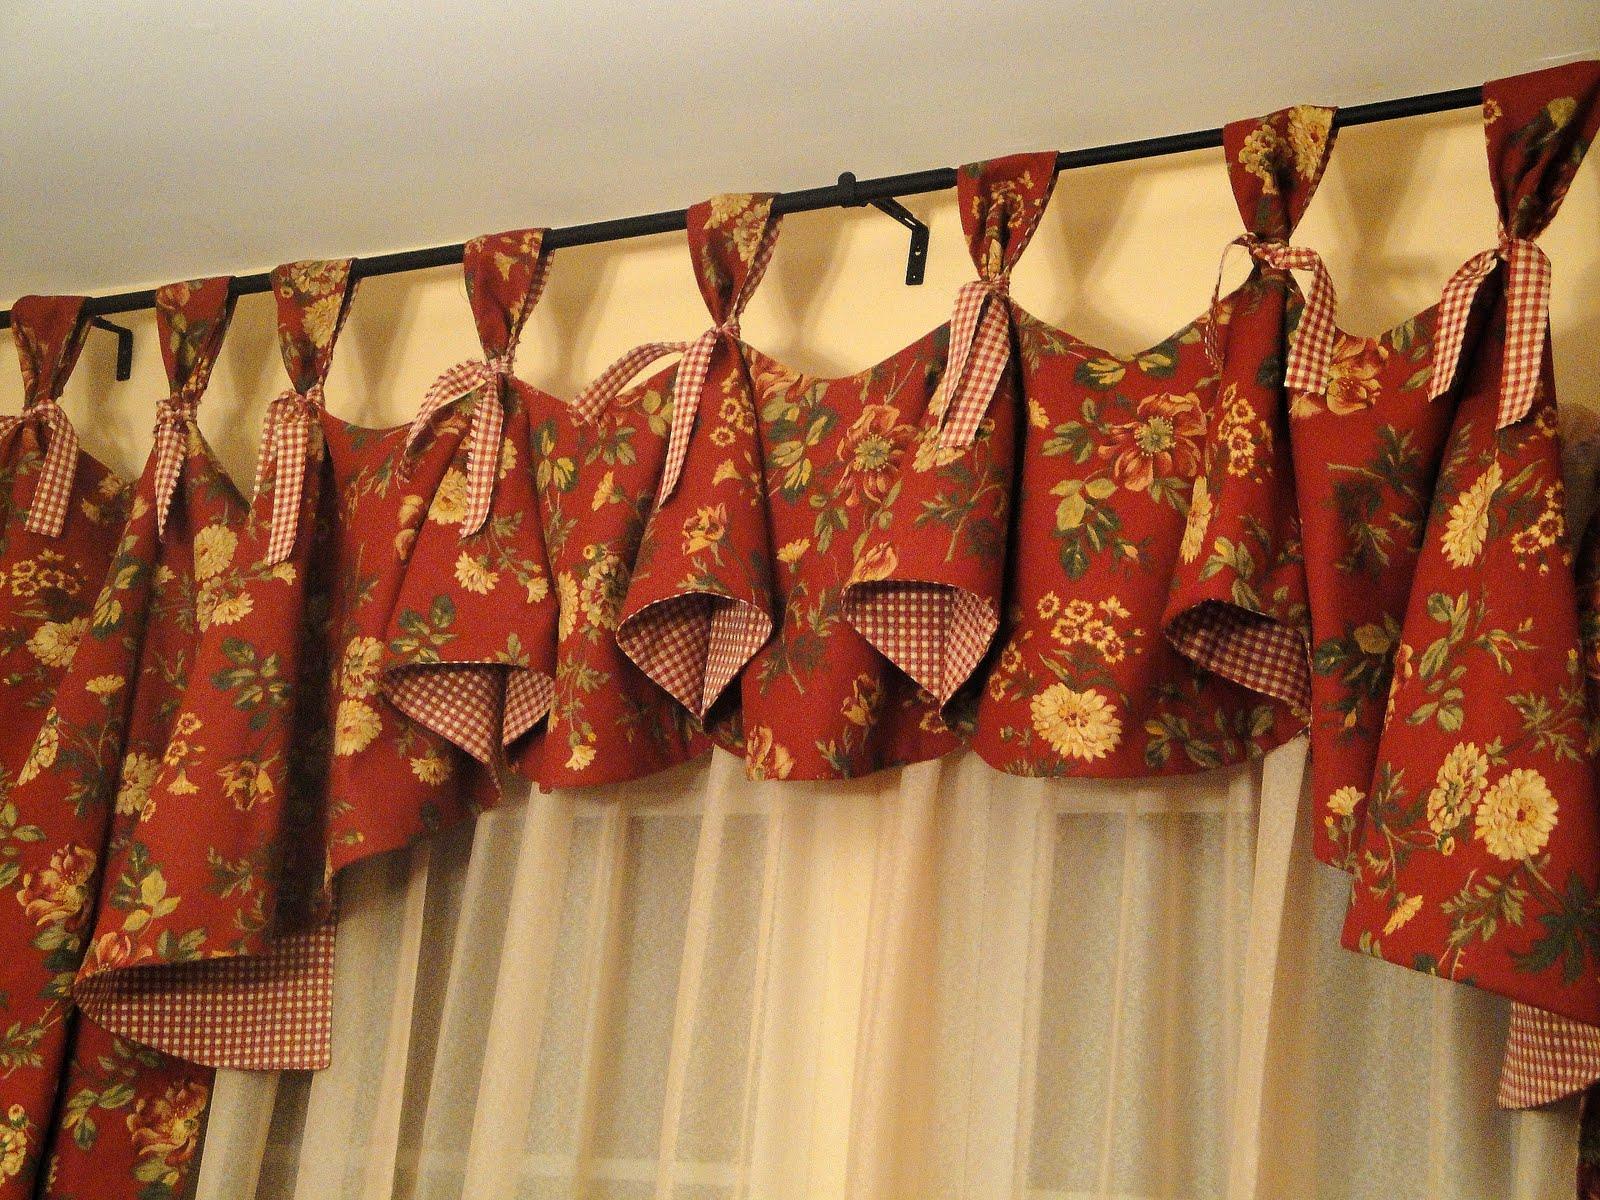 dining room valance | So Many Memories: New Dining Room Curtains